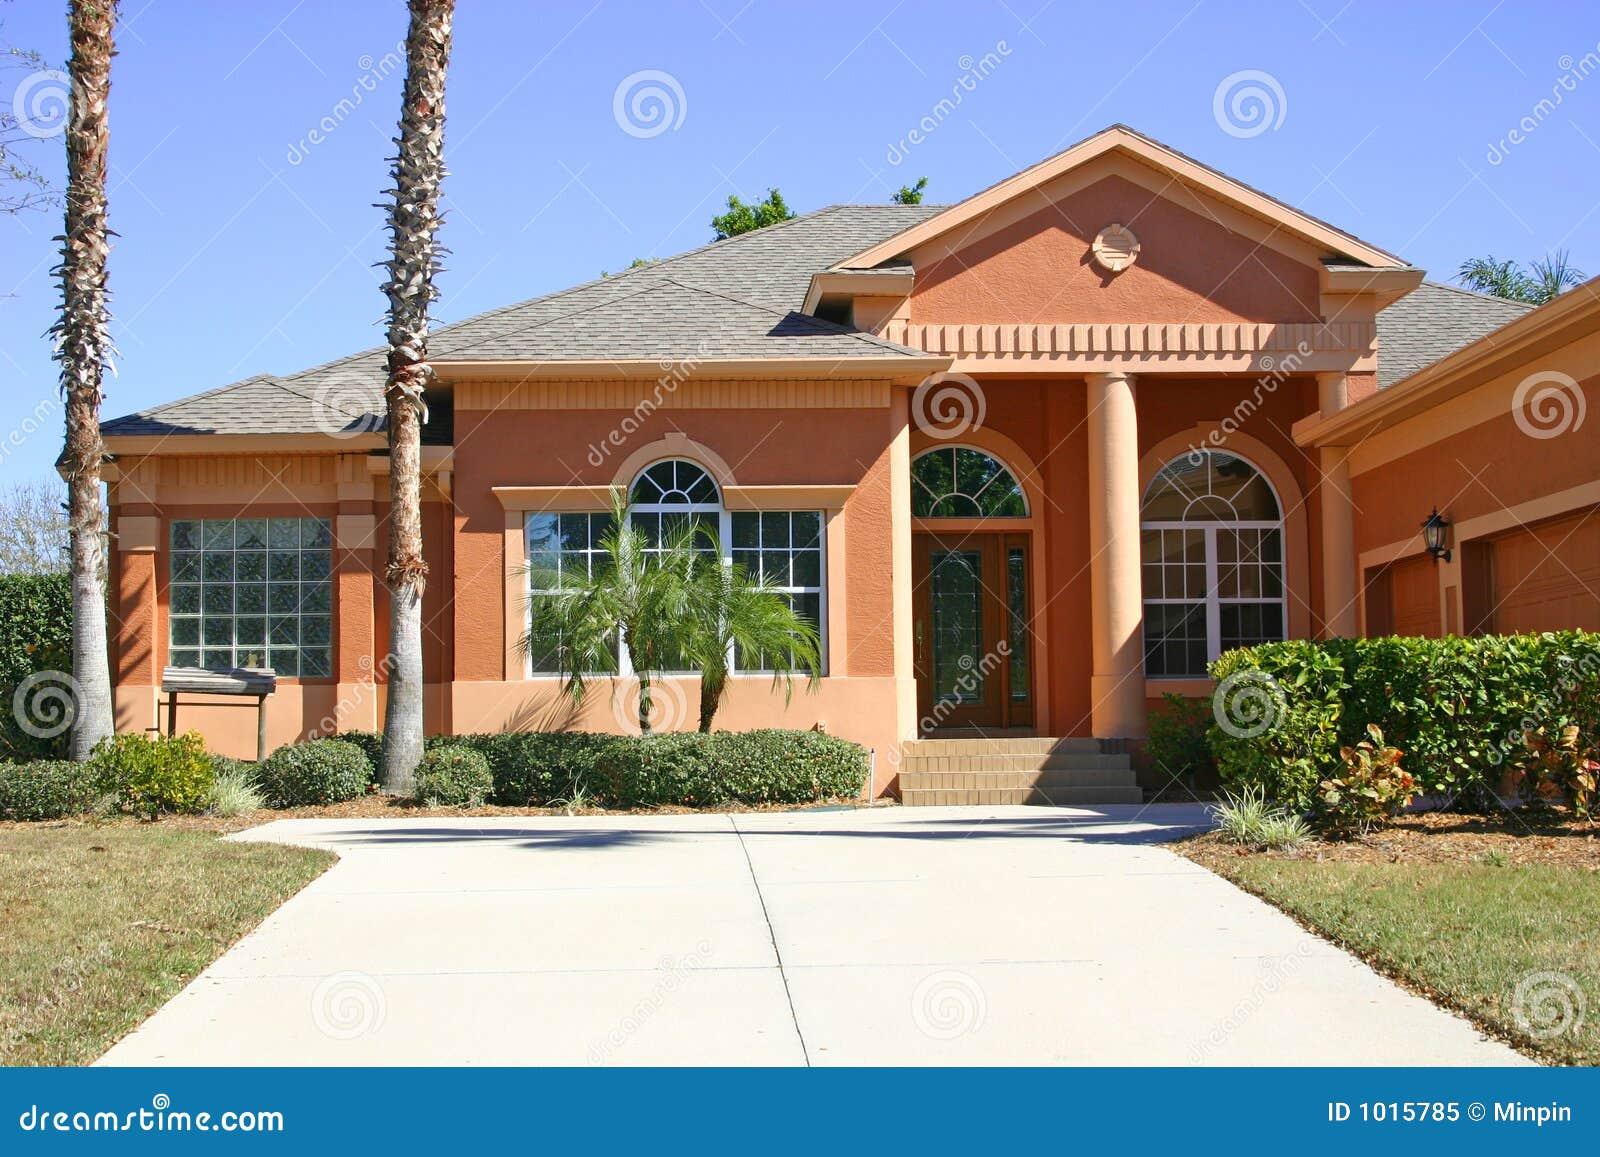 maison de terre cuite image stock image du famille hublots 1015785. Black Bedroom Furniture Sets. Home Design Ideas